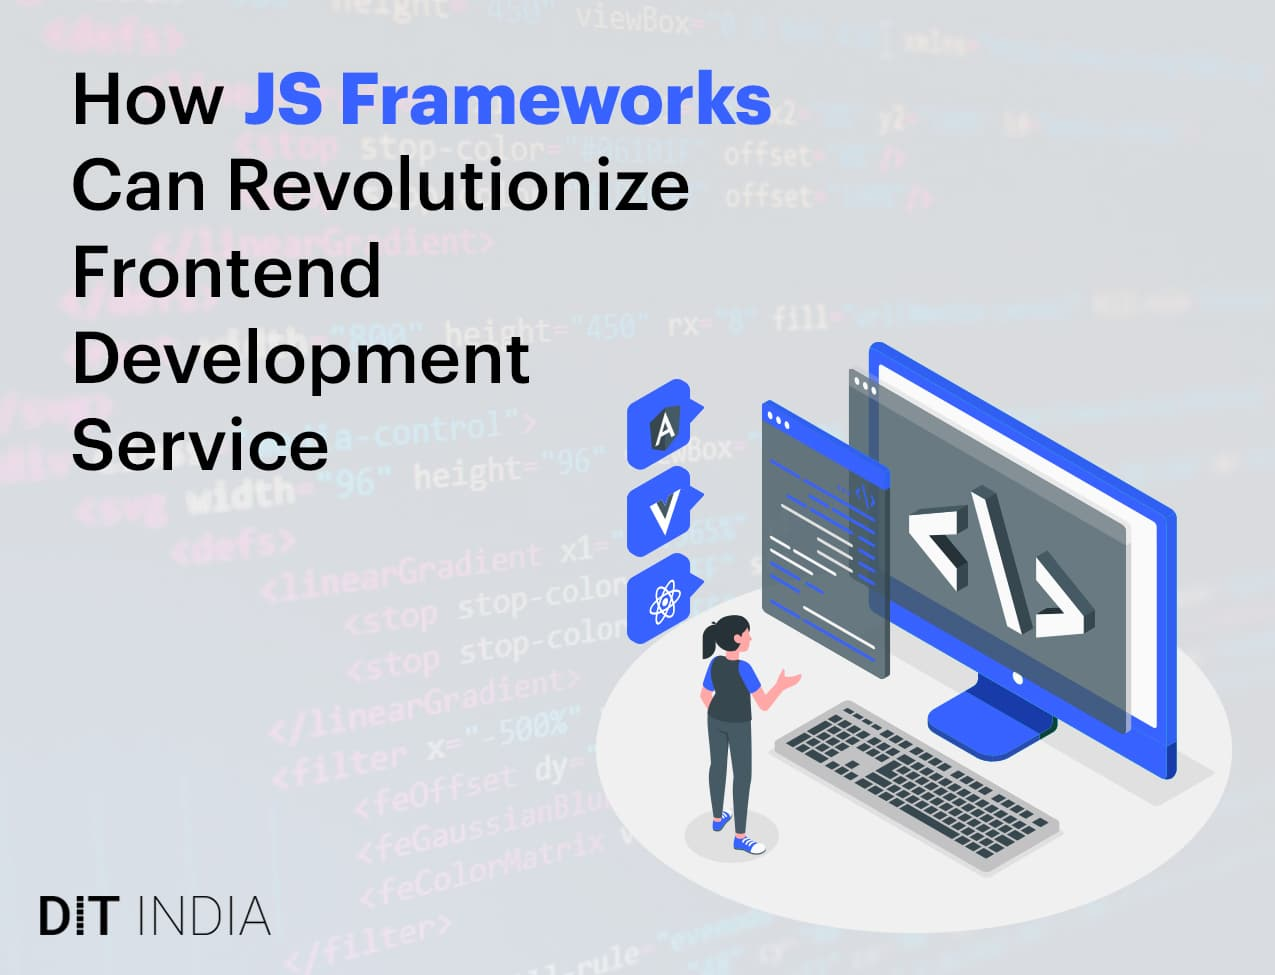 How JS Frameworks Can Revolutionize Frontend Development Service